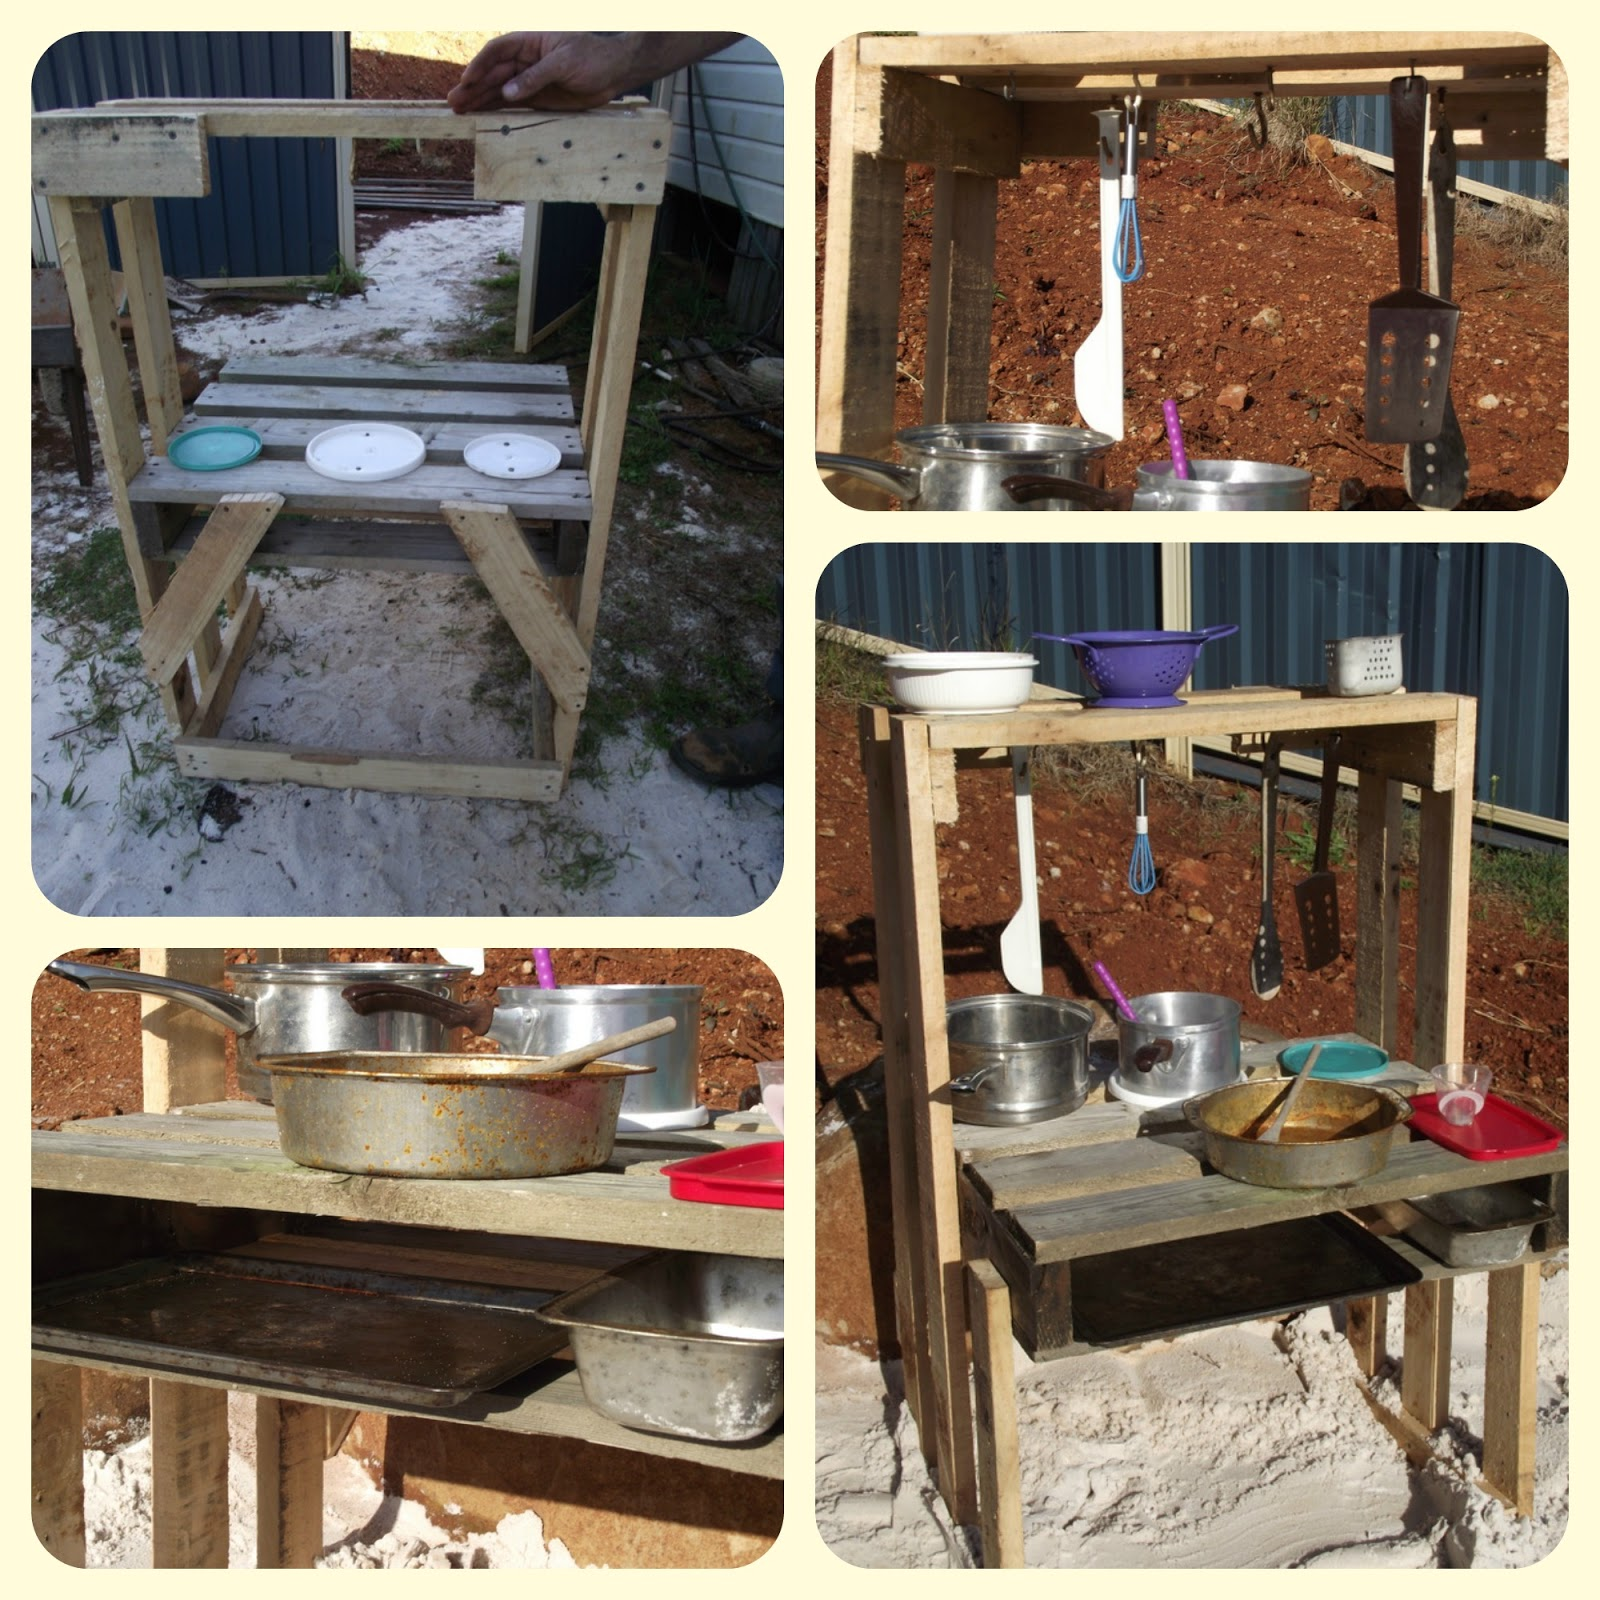 Kitchen Set Pallet: Building A Pallet Sand Kitchen